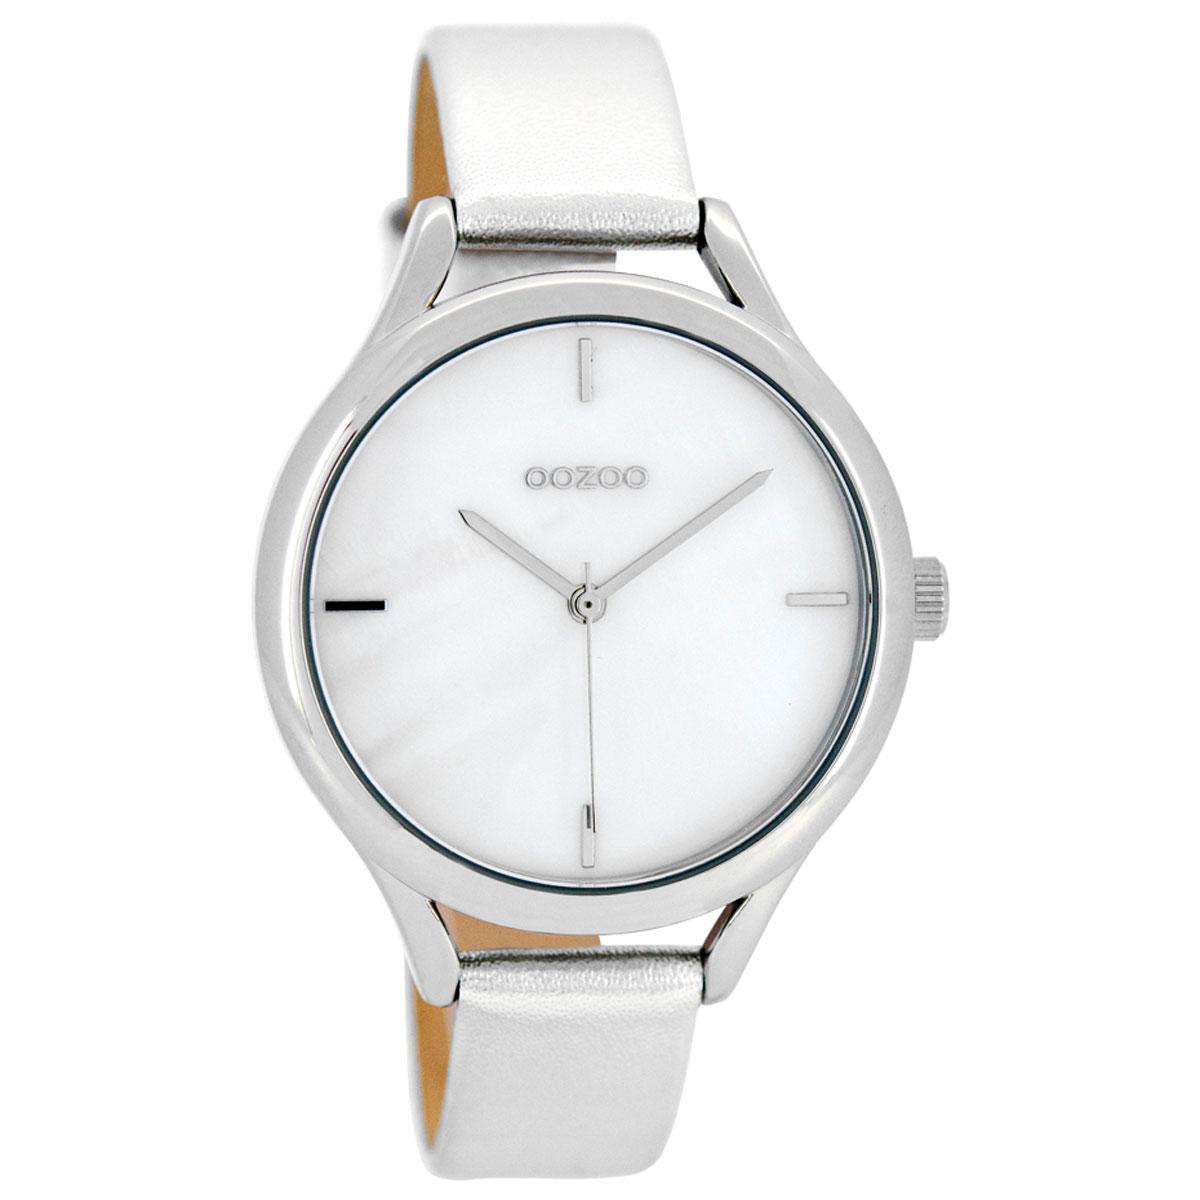 OOZOO Timepieces γυναικείο ρολόι με ασημί μεταλλική κάσα και ασημί  δερμάτινο λουράκι C8345 86eacd3135b